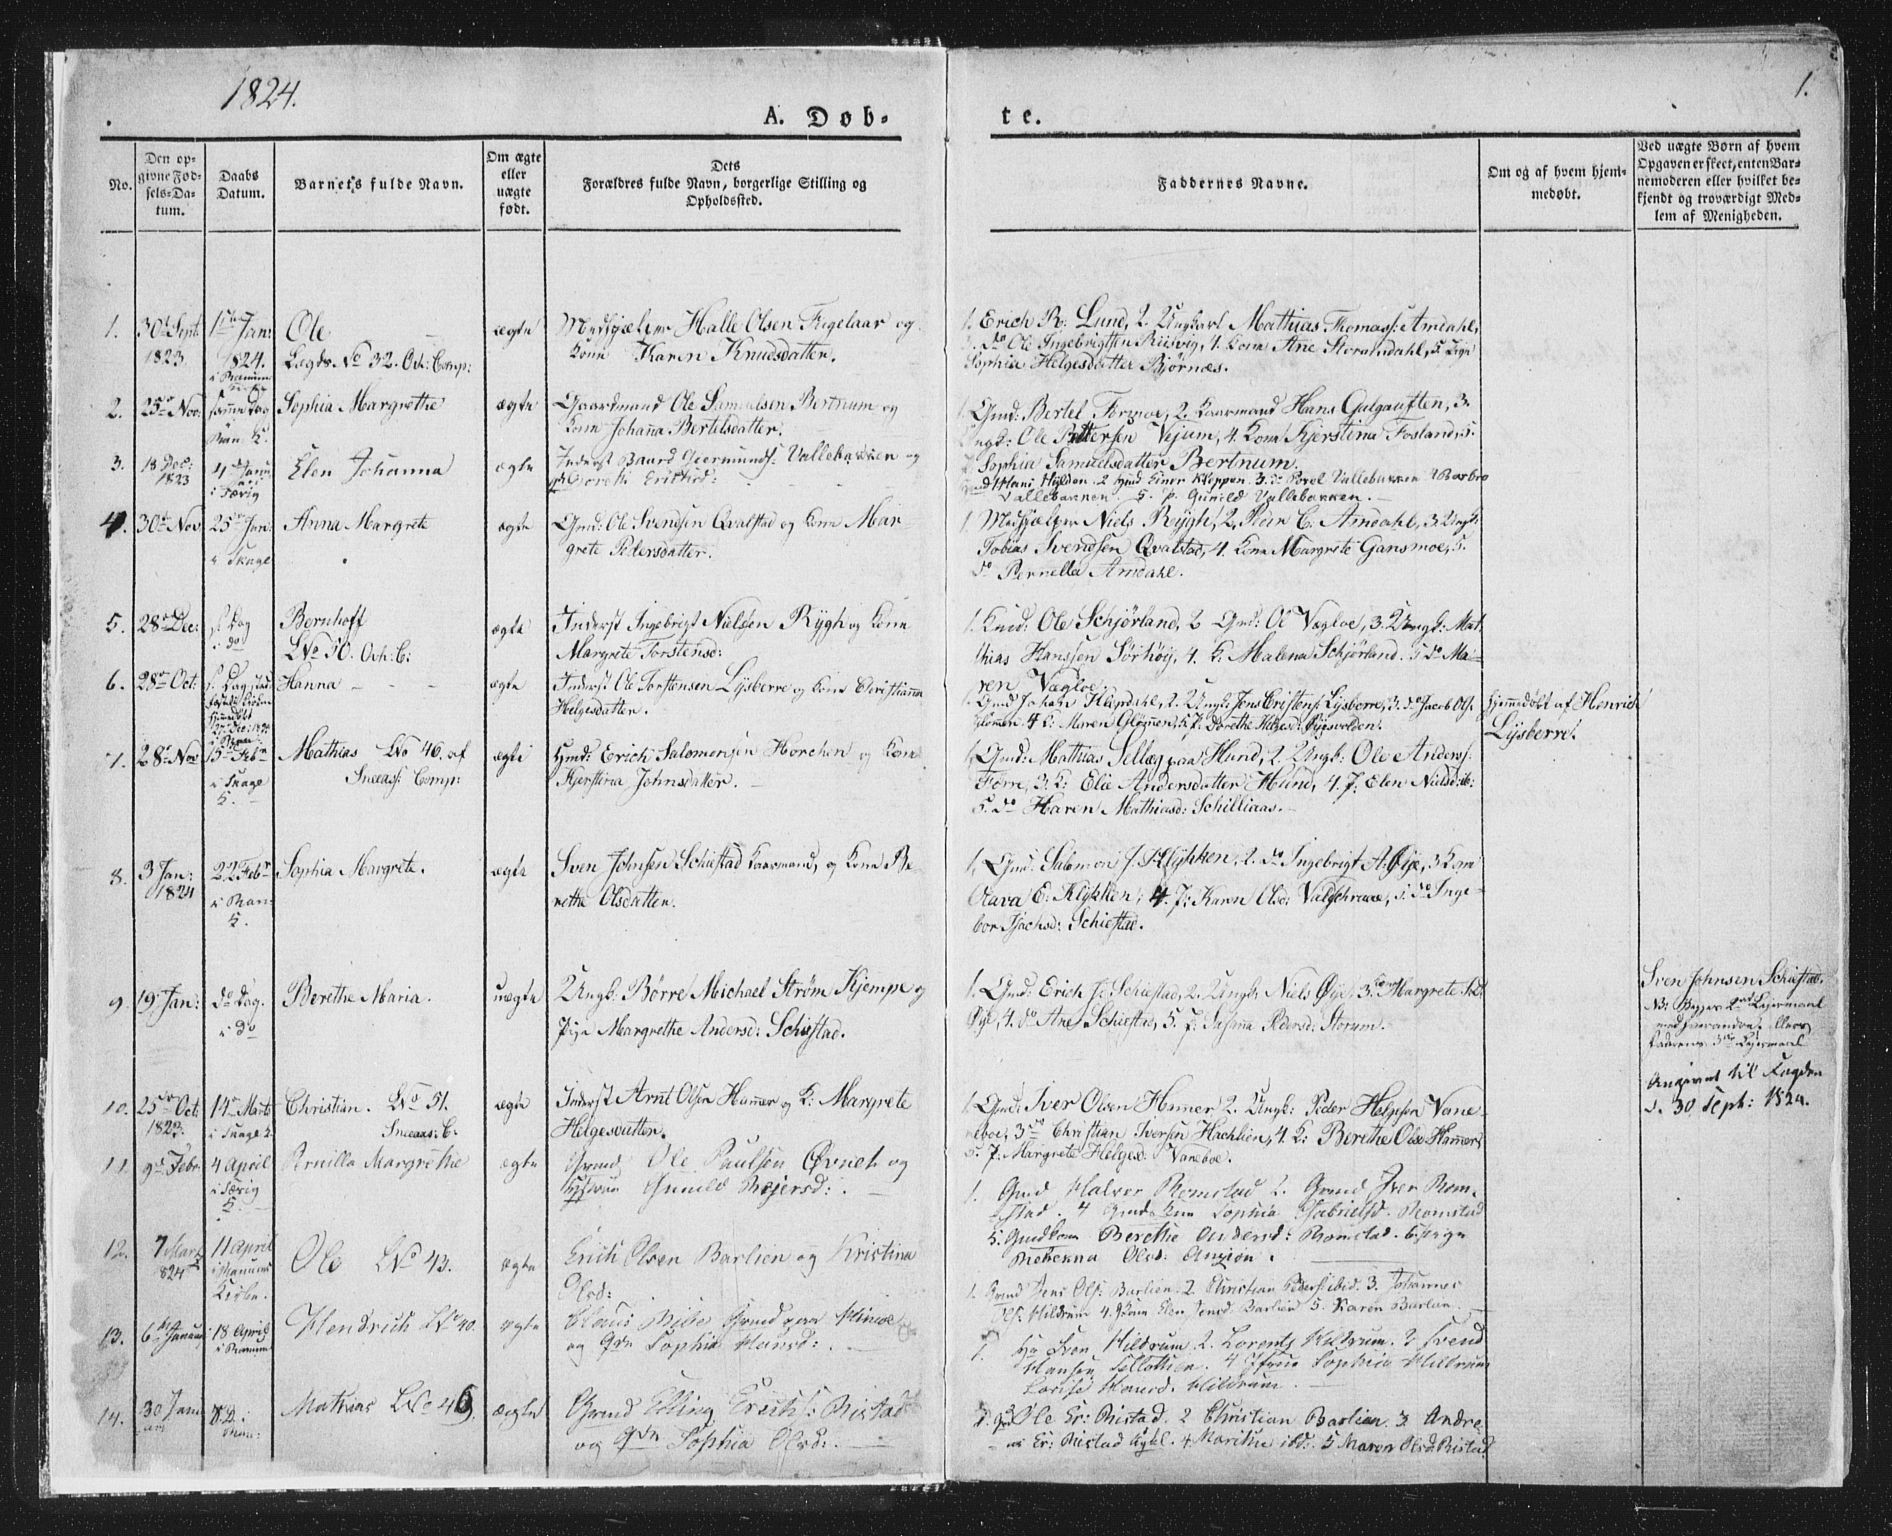 SAT, Ministerialprotokoller, klokkerbøker og fødselsregistre - Nord-Trøndelag, 764/L0551: Ministerialbok nr. 764A07a, 1824-1864, s. 1